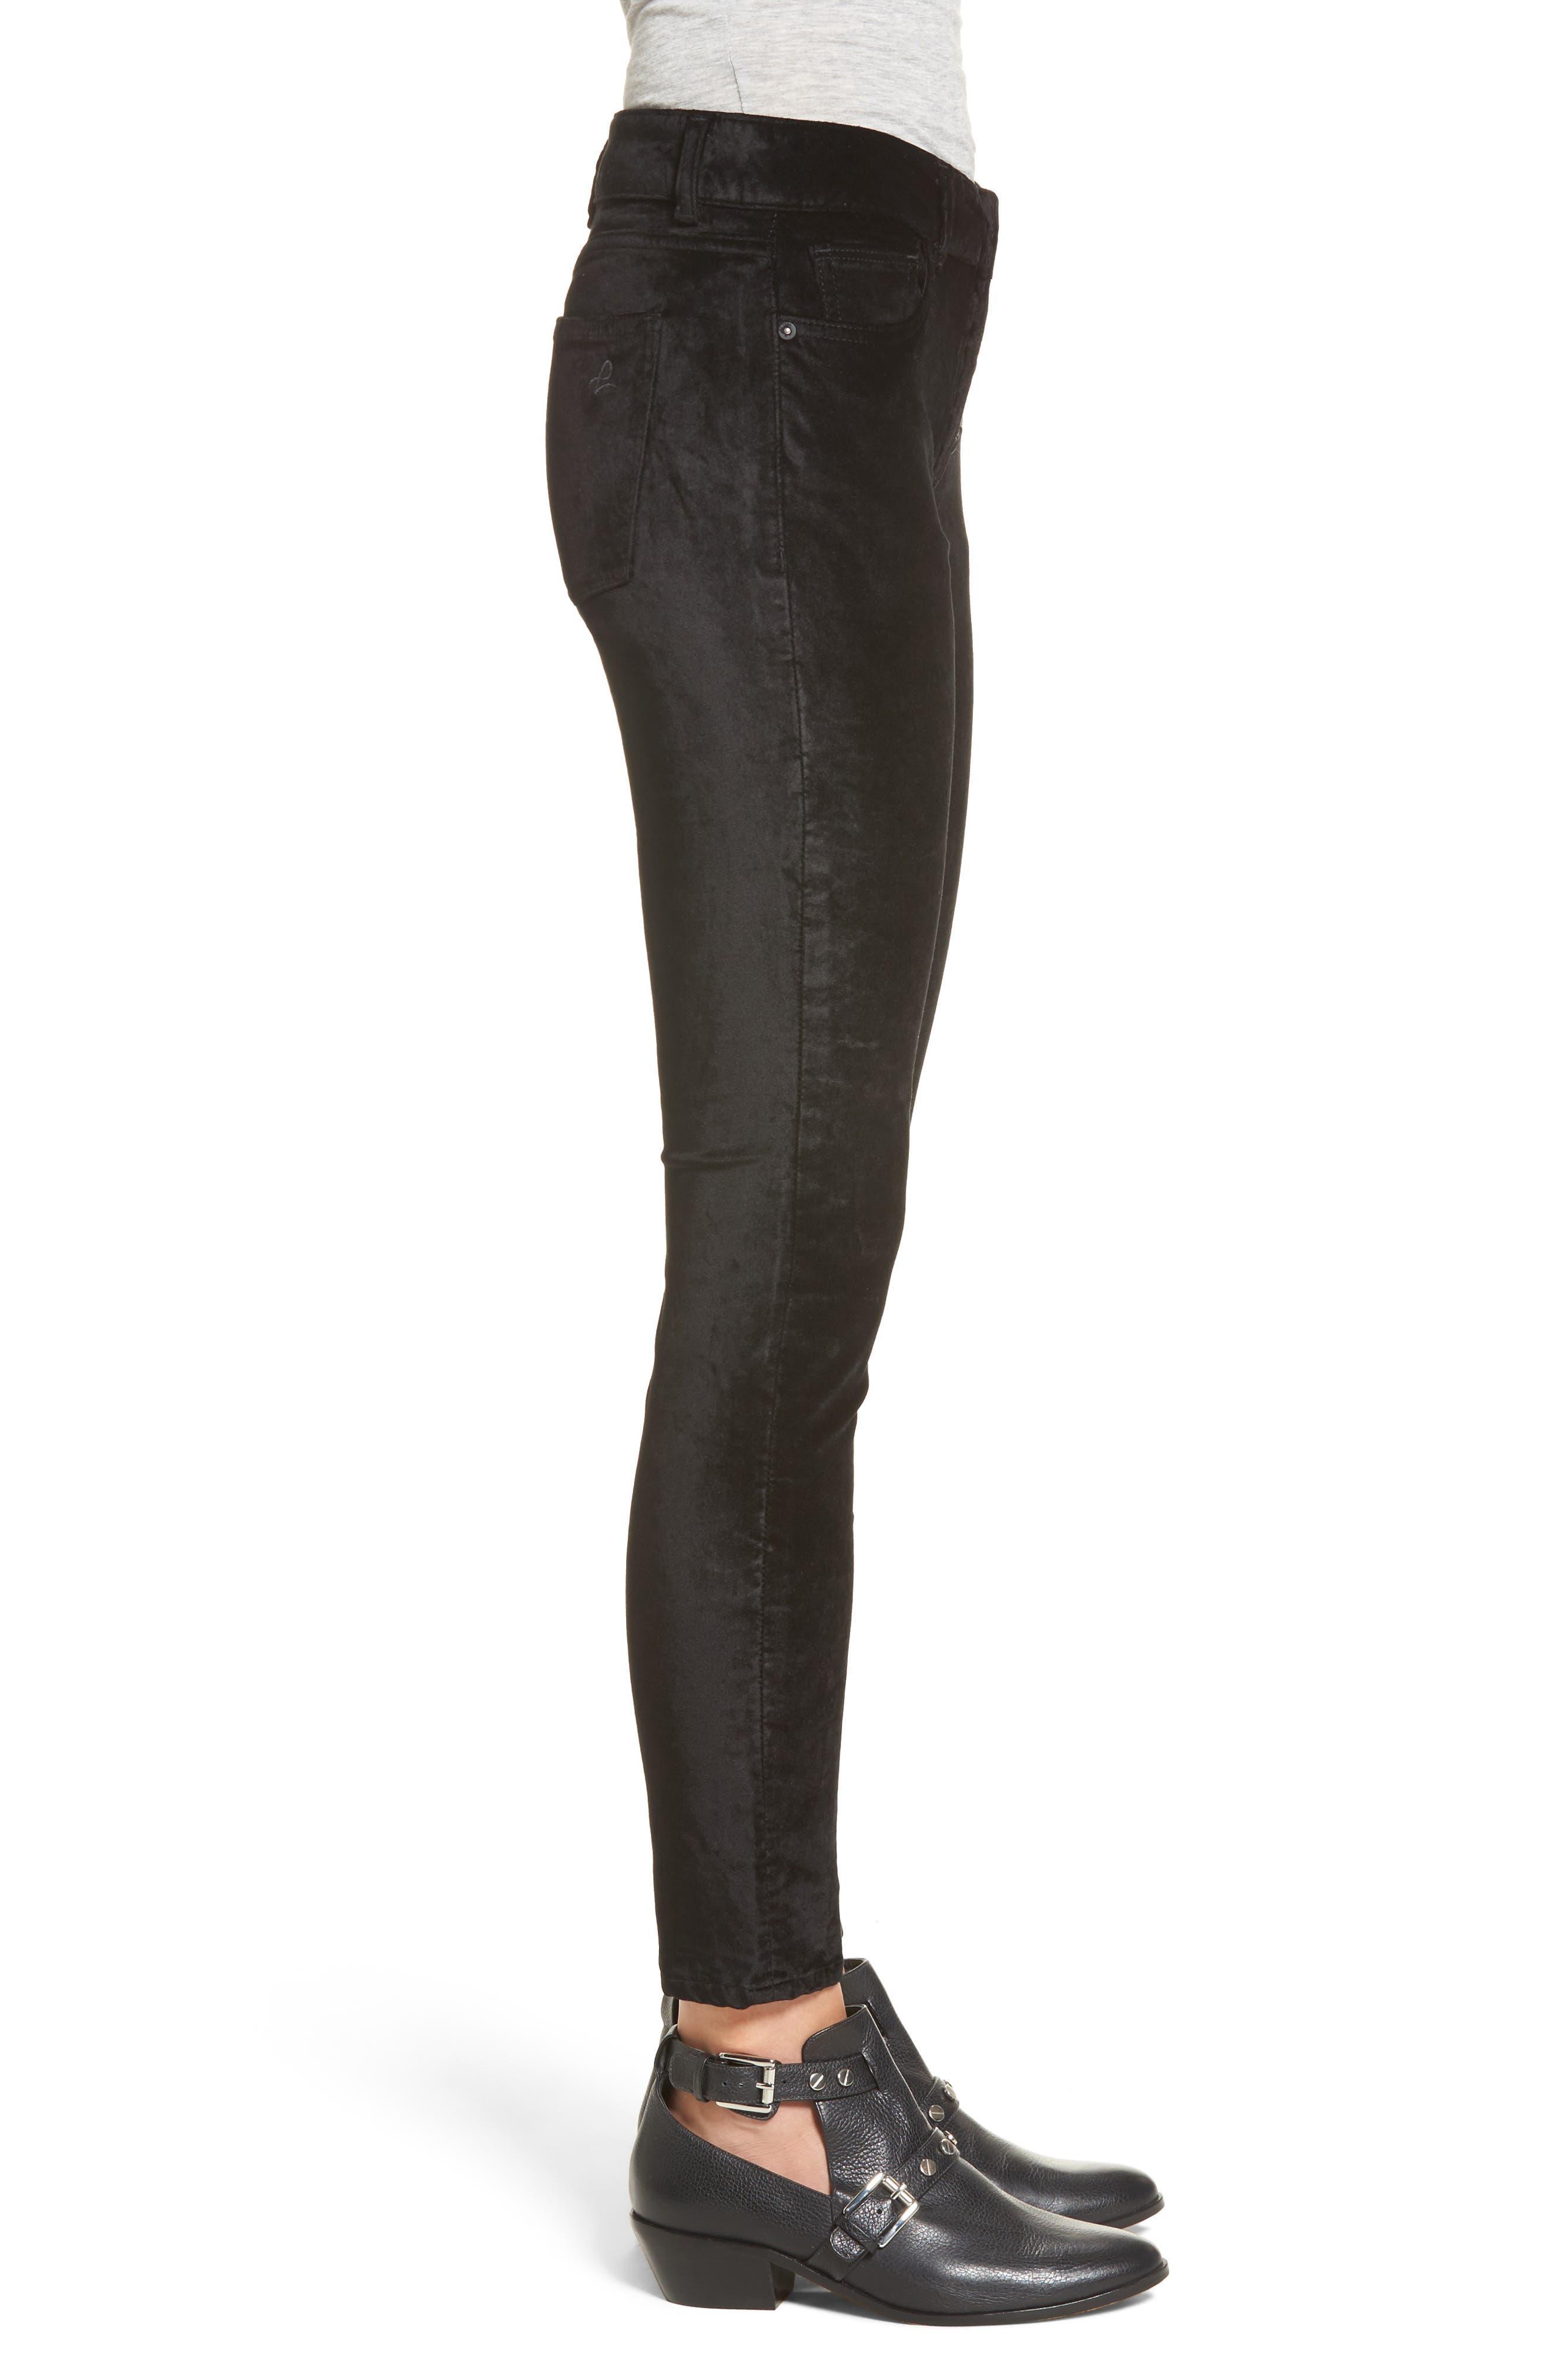 Emma Power Legging Jeans,                             Alternate thumbnail 3, color,                             001